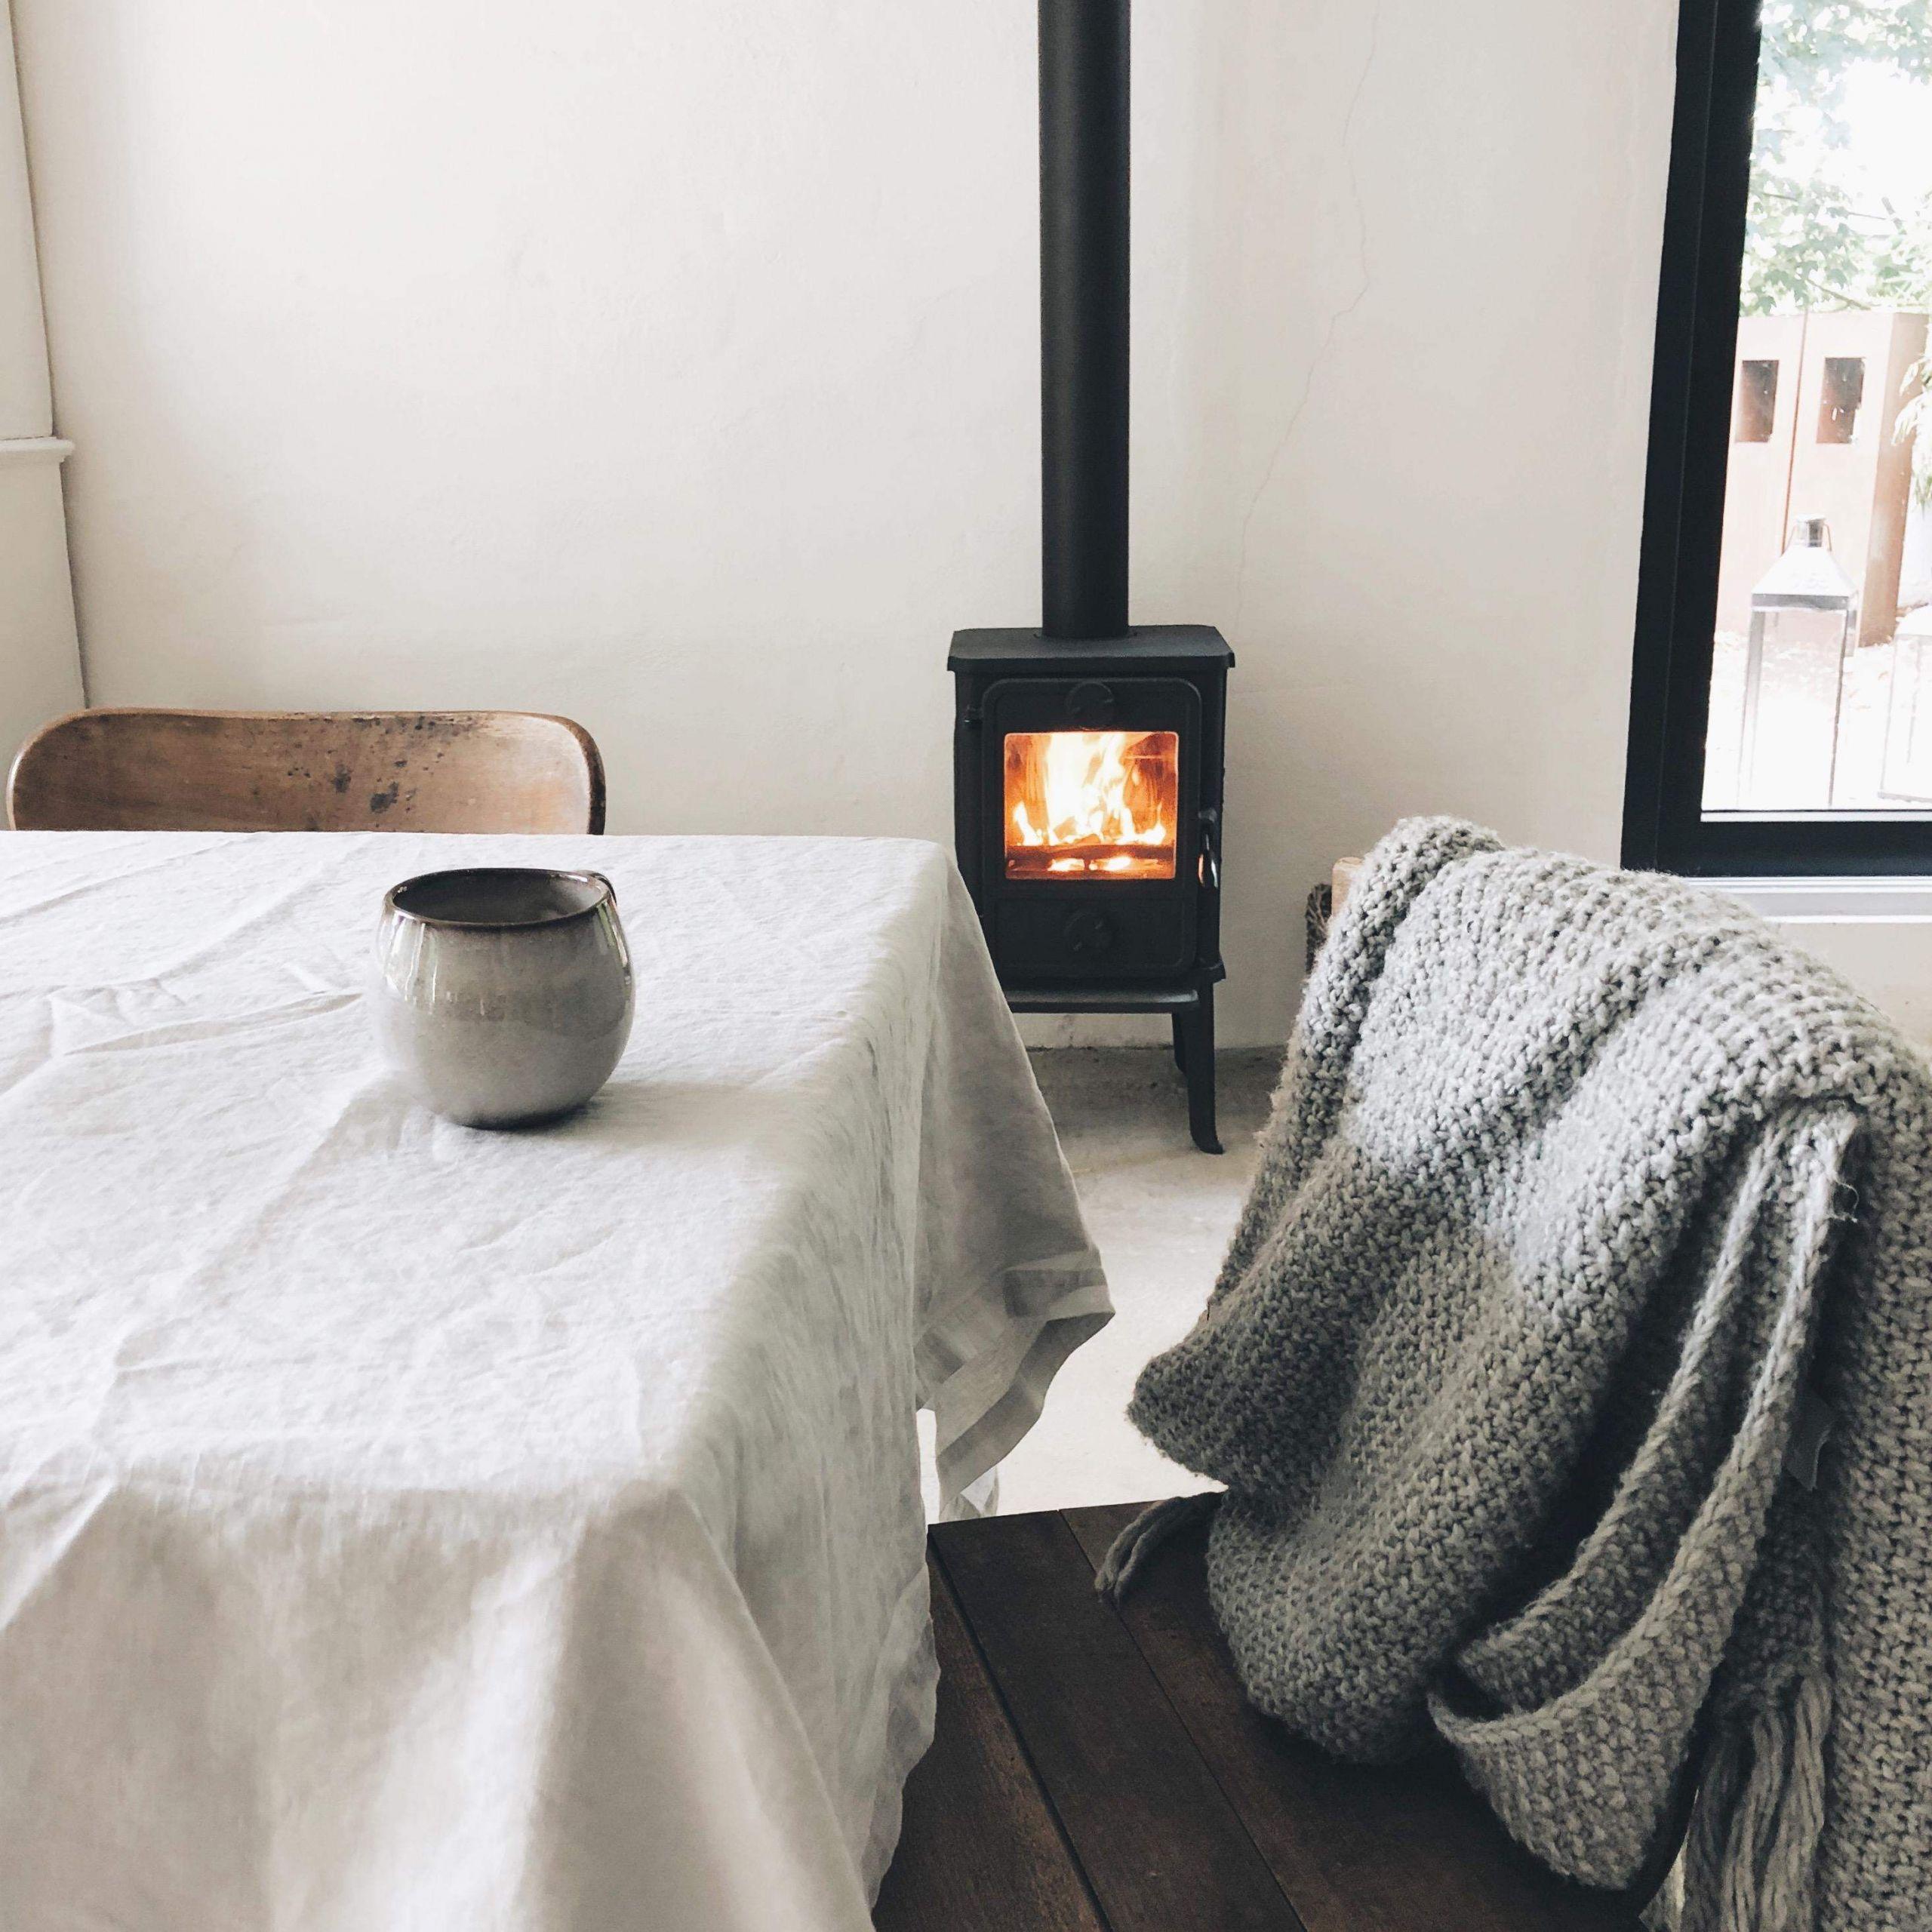 cozy day cozy hygge herbst kamin dd6f8d2f 0eff 4e4f b285 d70a cd